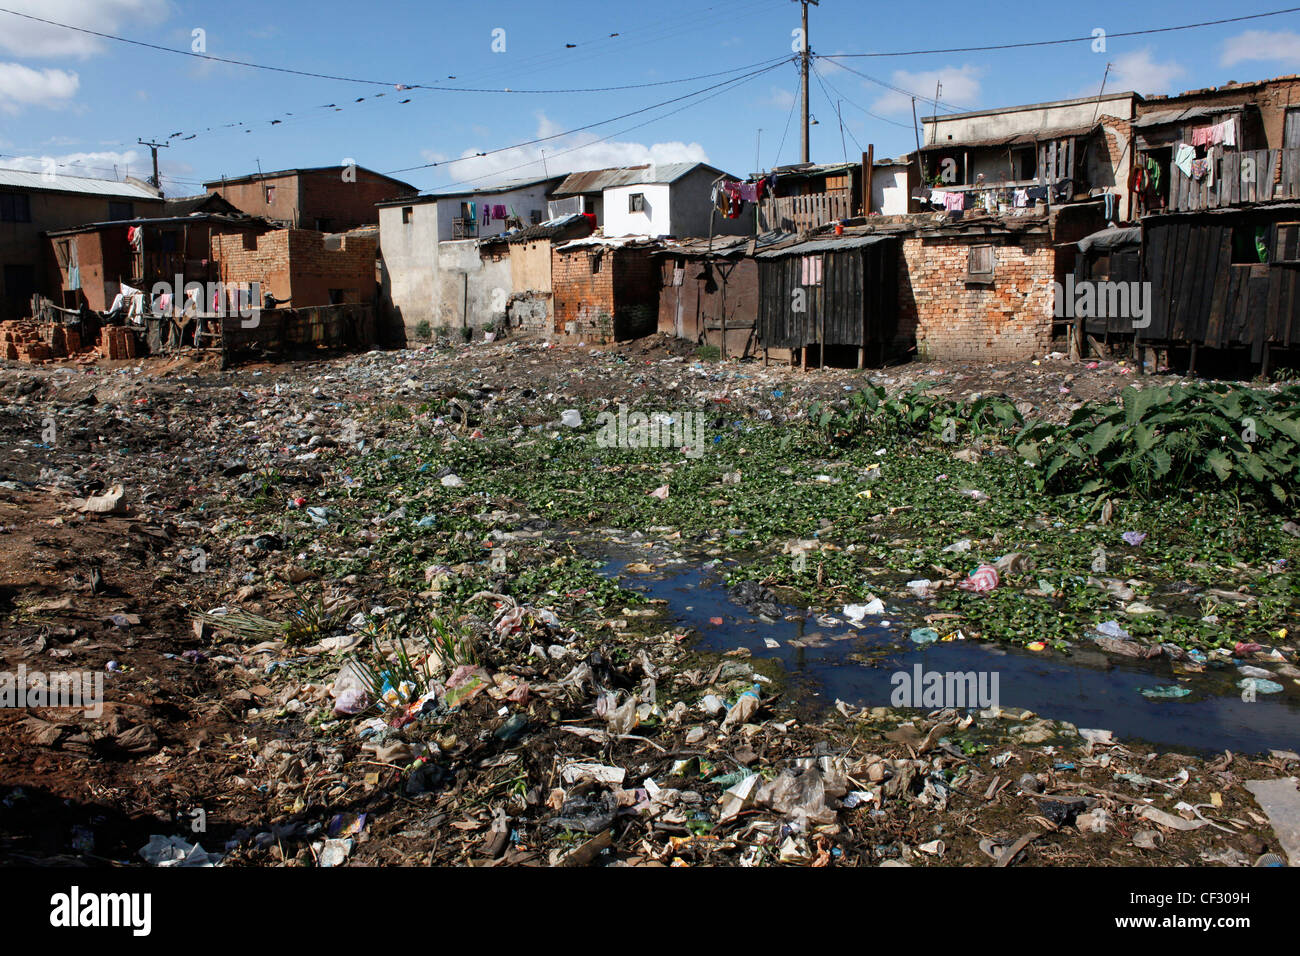 Un barrio residencial de la capital de Madagascar, Antananarivo. Imagen De Stock